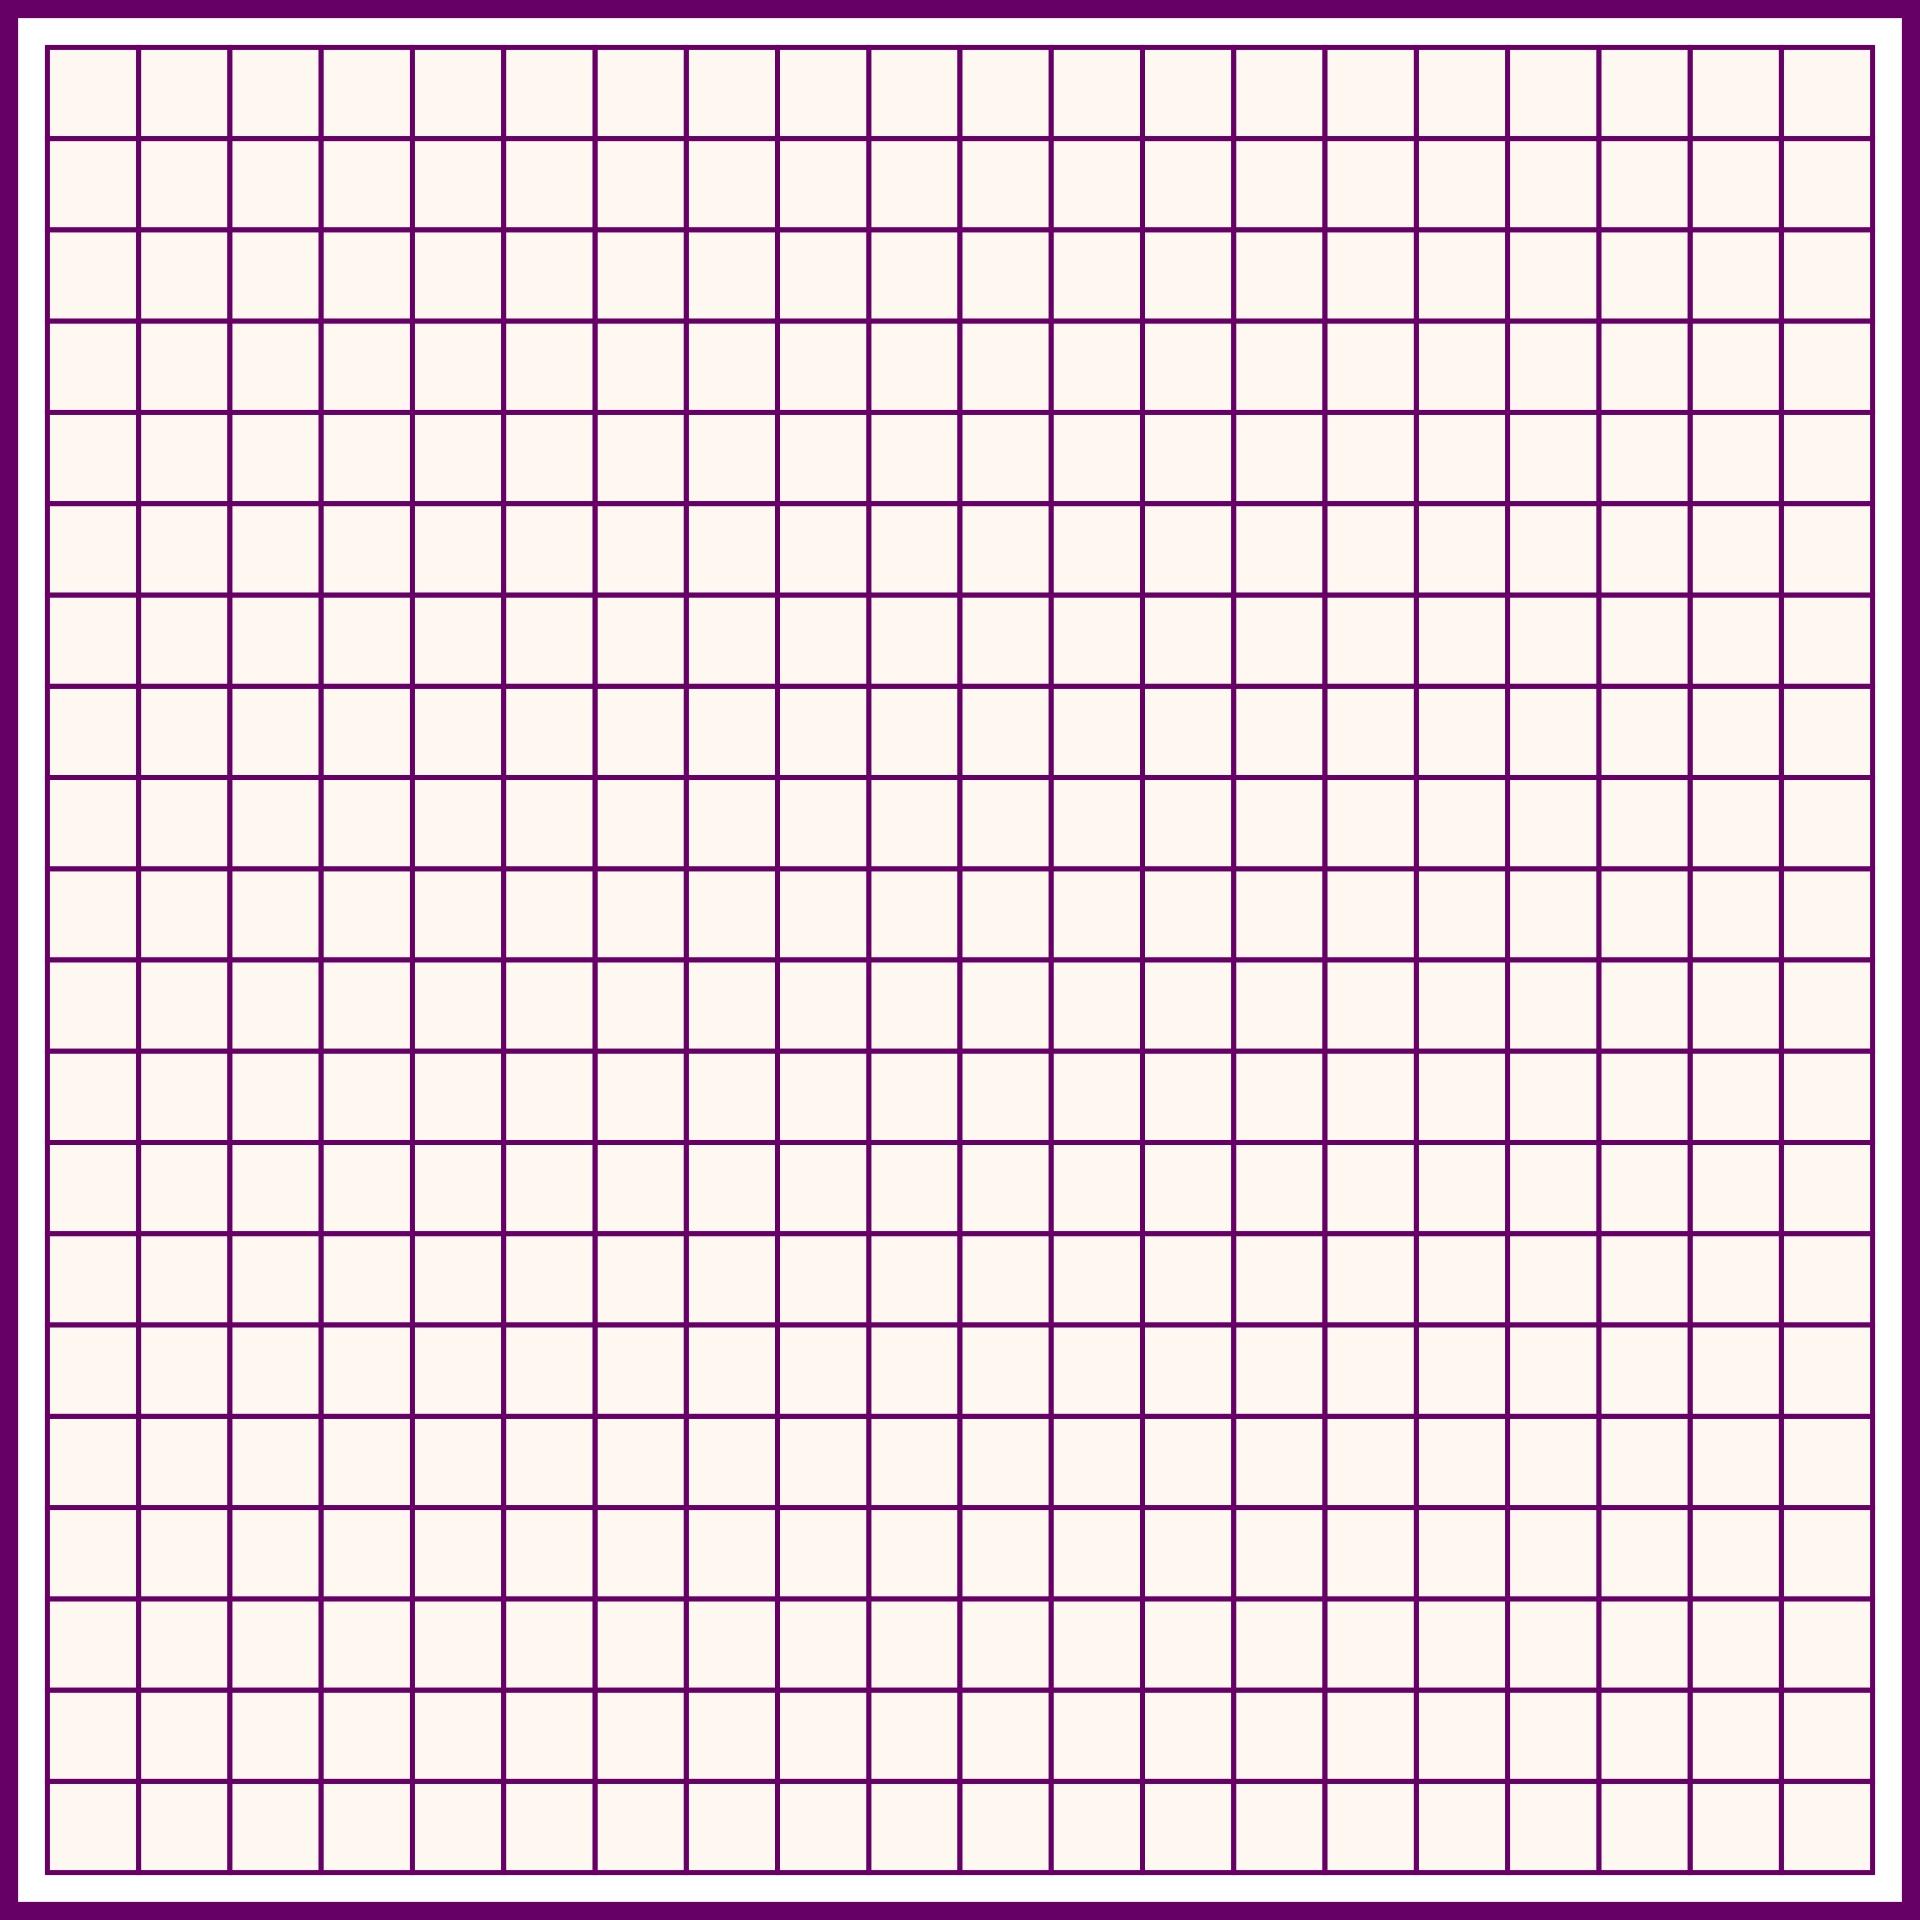 Grid Printable - Printable Grid Graph Paper 20X20, 20 X 20 Graph Paper ...